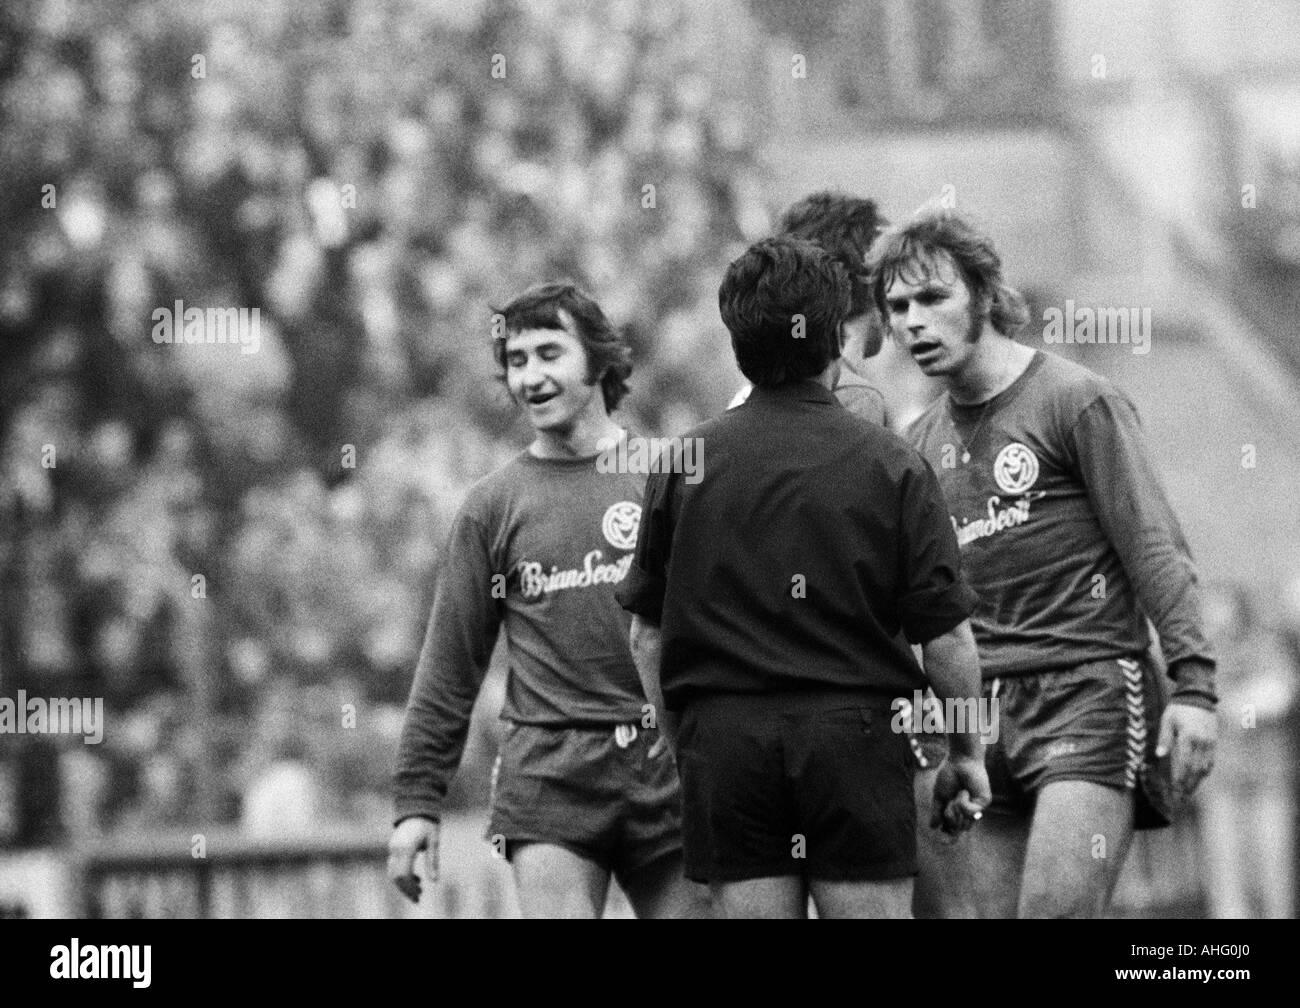 football, Bundesliga, 1973/1974, Boekelberg Stadium, Borussia Moenchengladbach versus MSV Duisburg 3:2, scene of Stock Photo